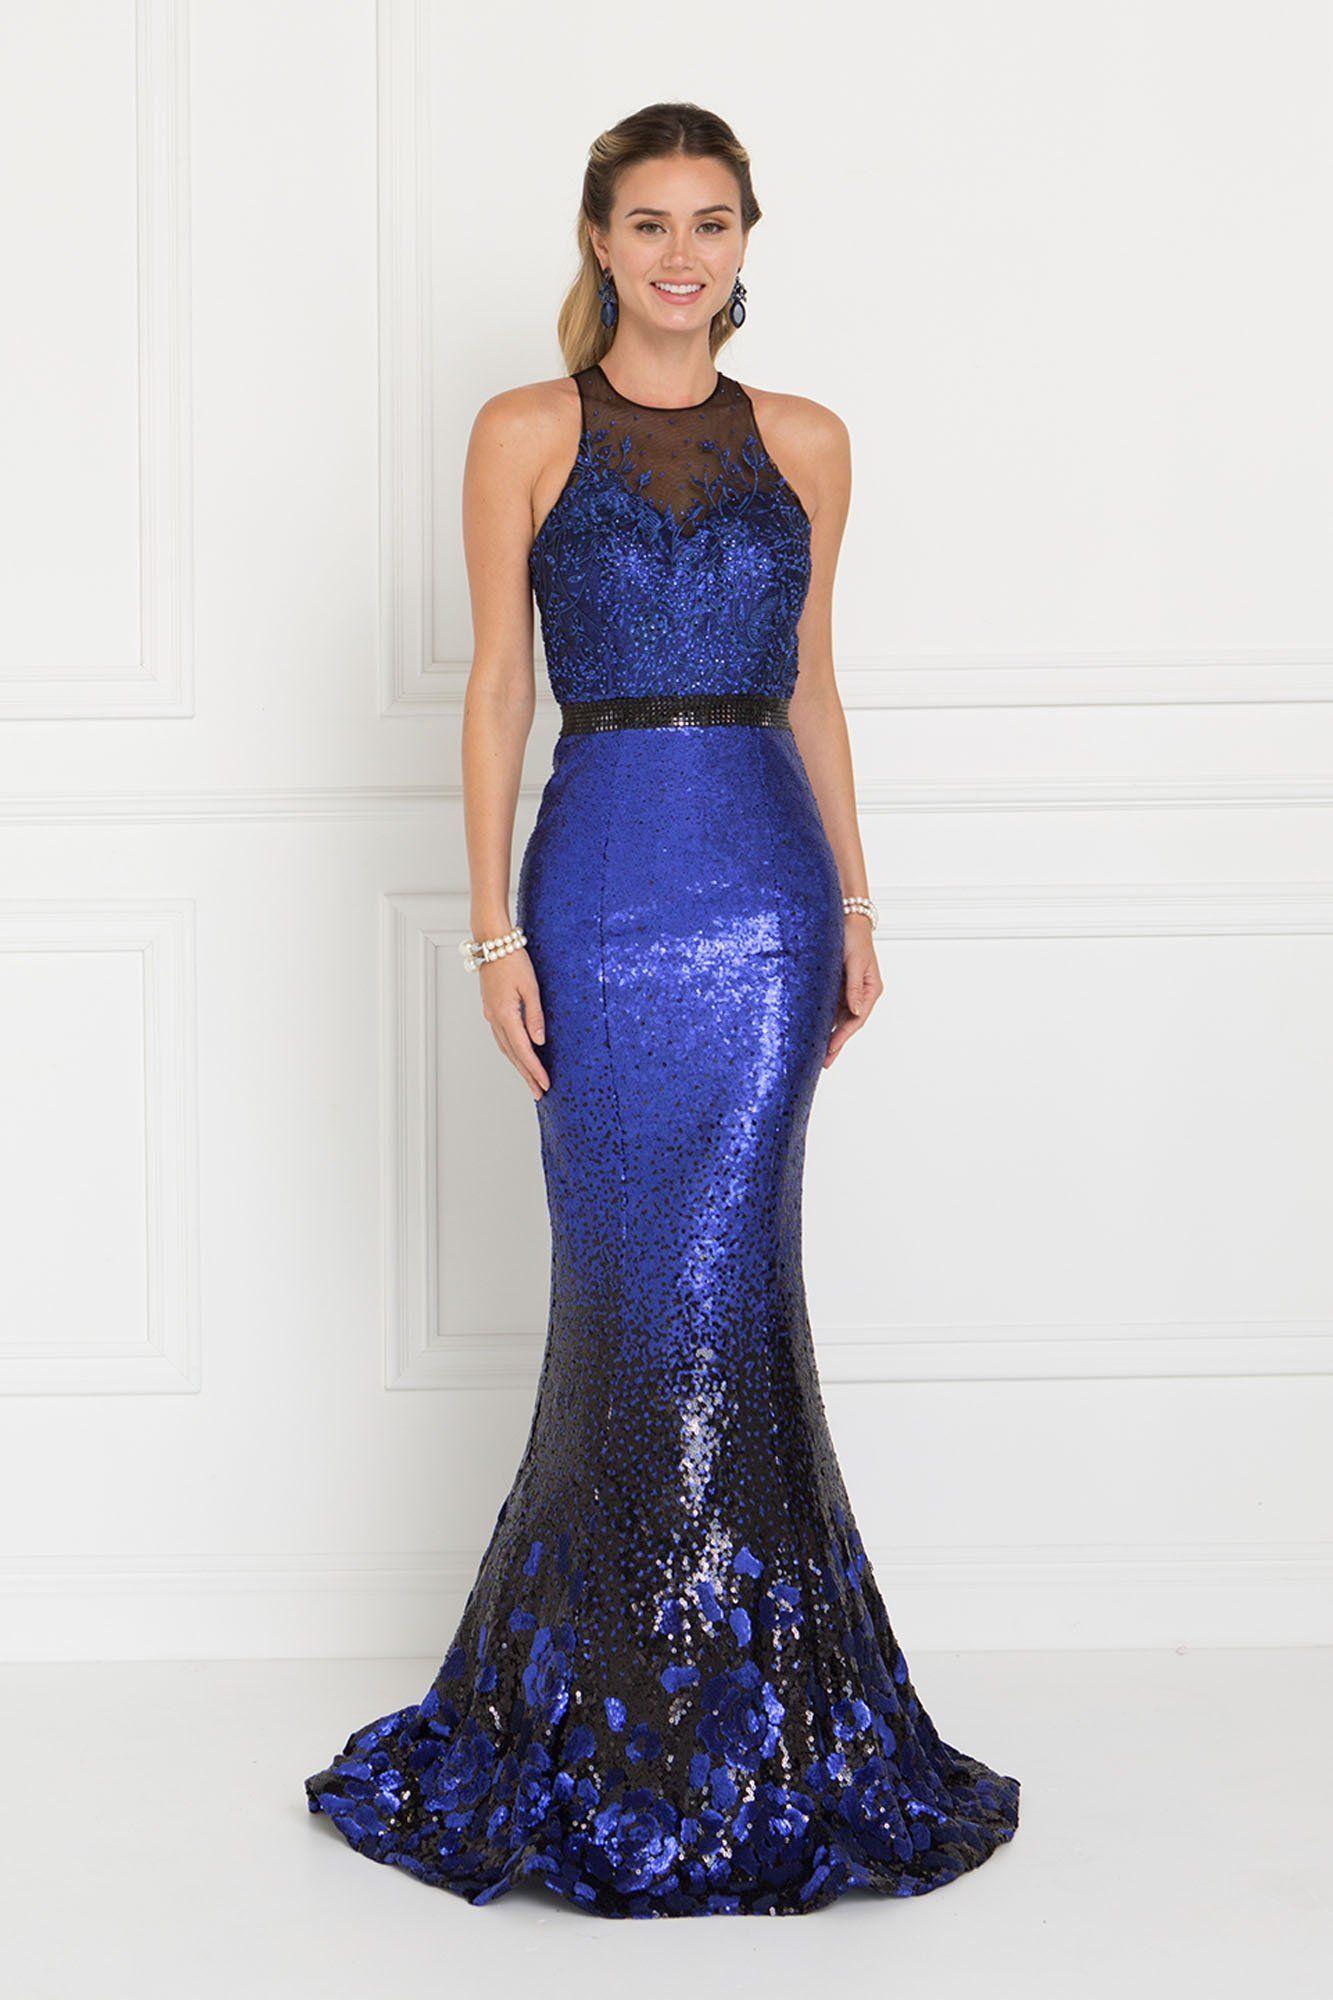 Mermaid sequins prom dress gls steal the look pinterest